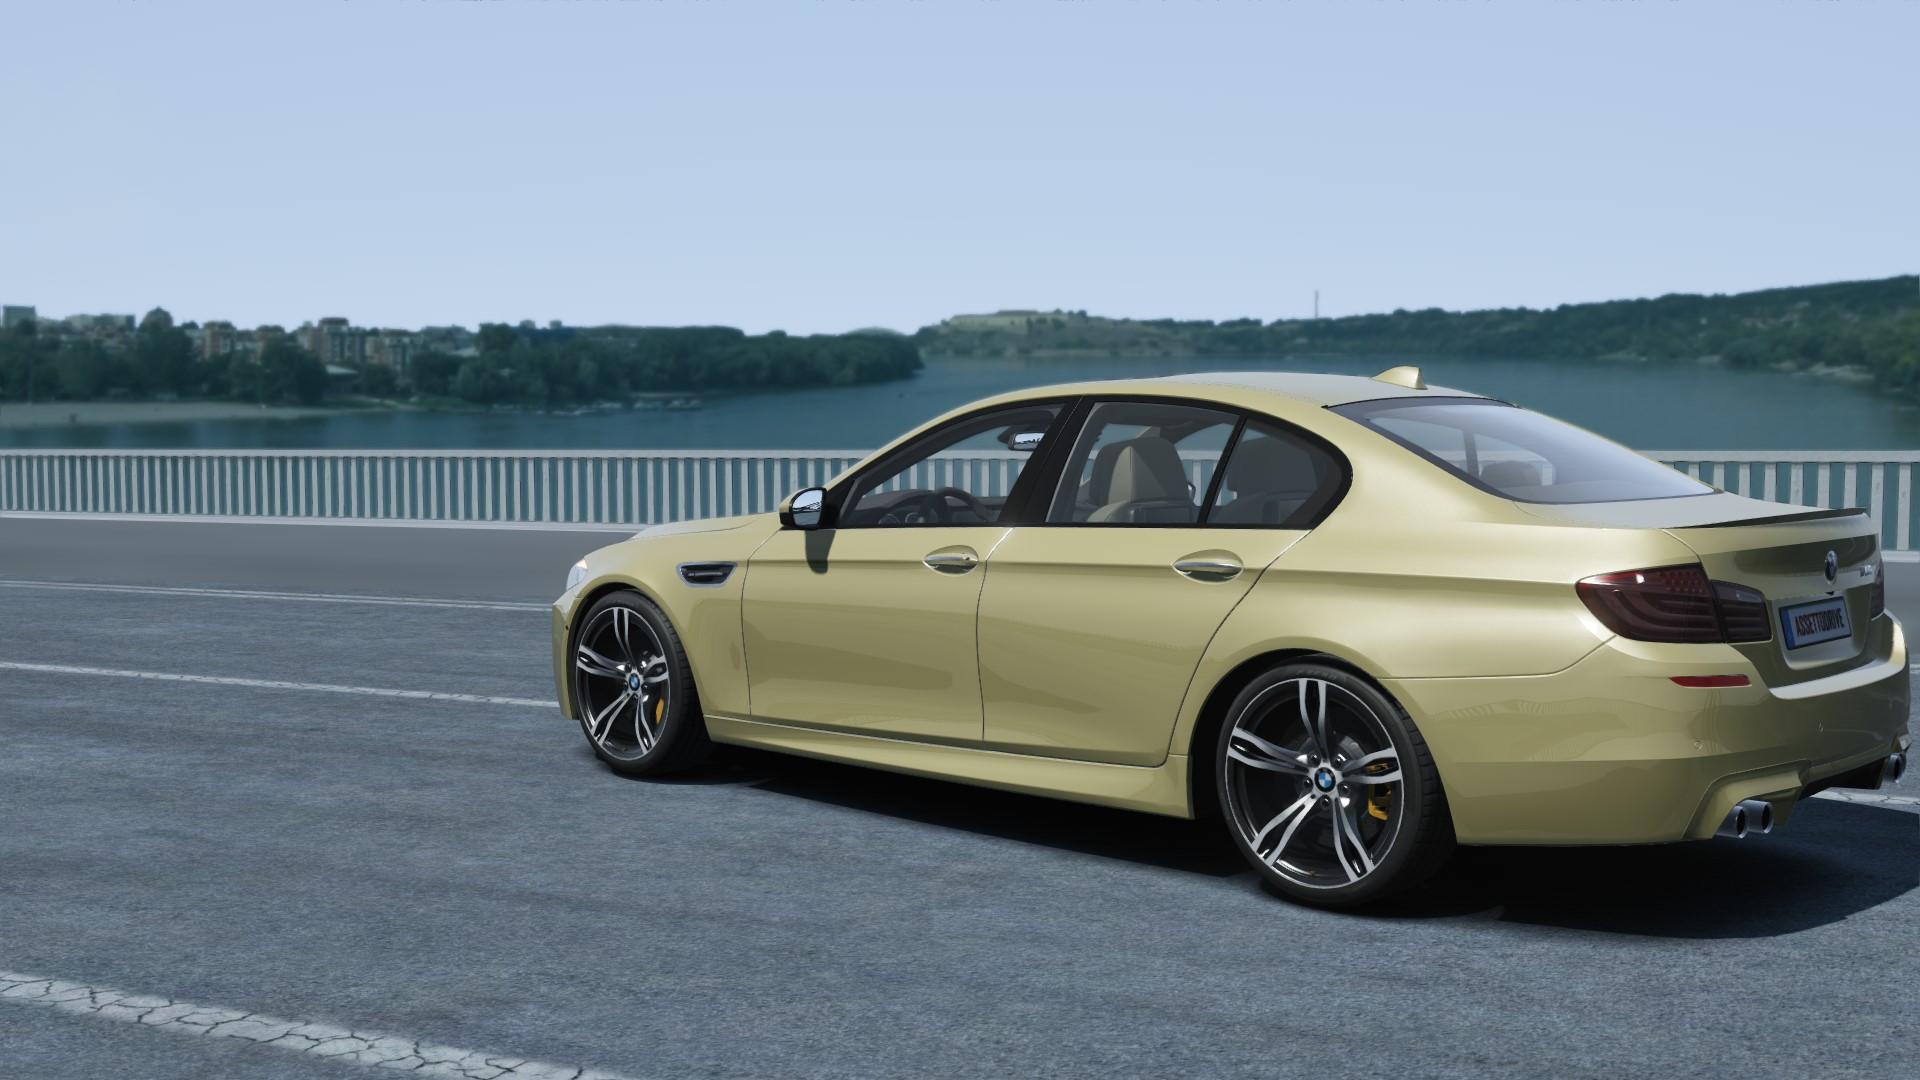 BMW M5 F10 at Miseluk.jpg